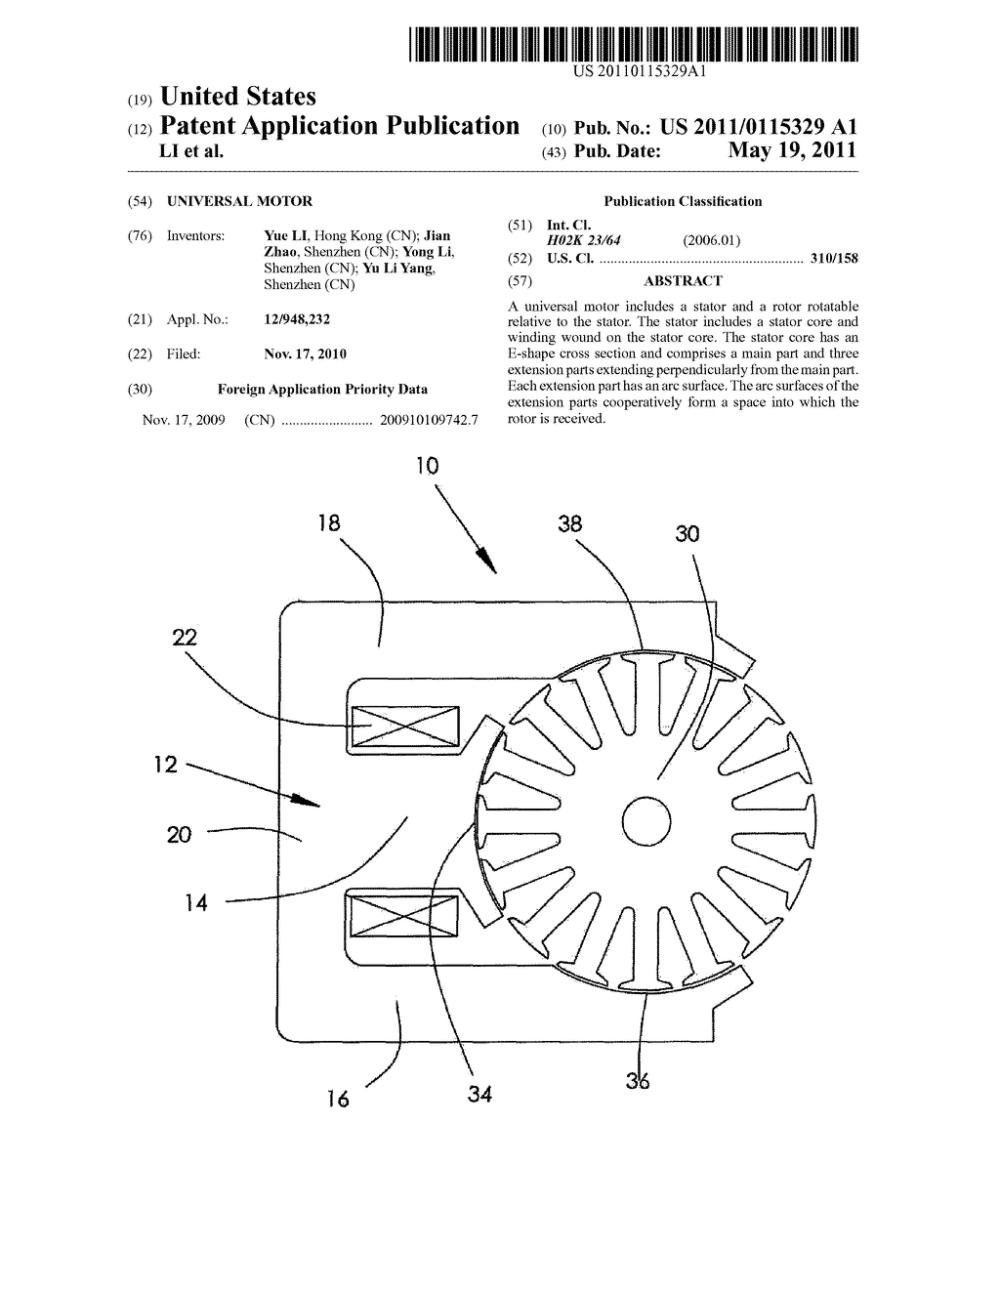 medium resolution of universal motor diagram 23 wiring diagram images magnetek universal electric motor wiring diagram magnetek universal electric